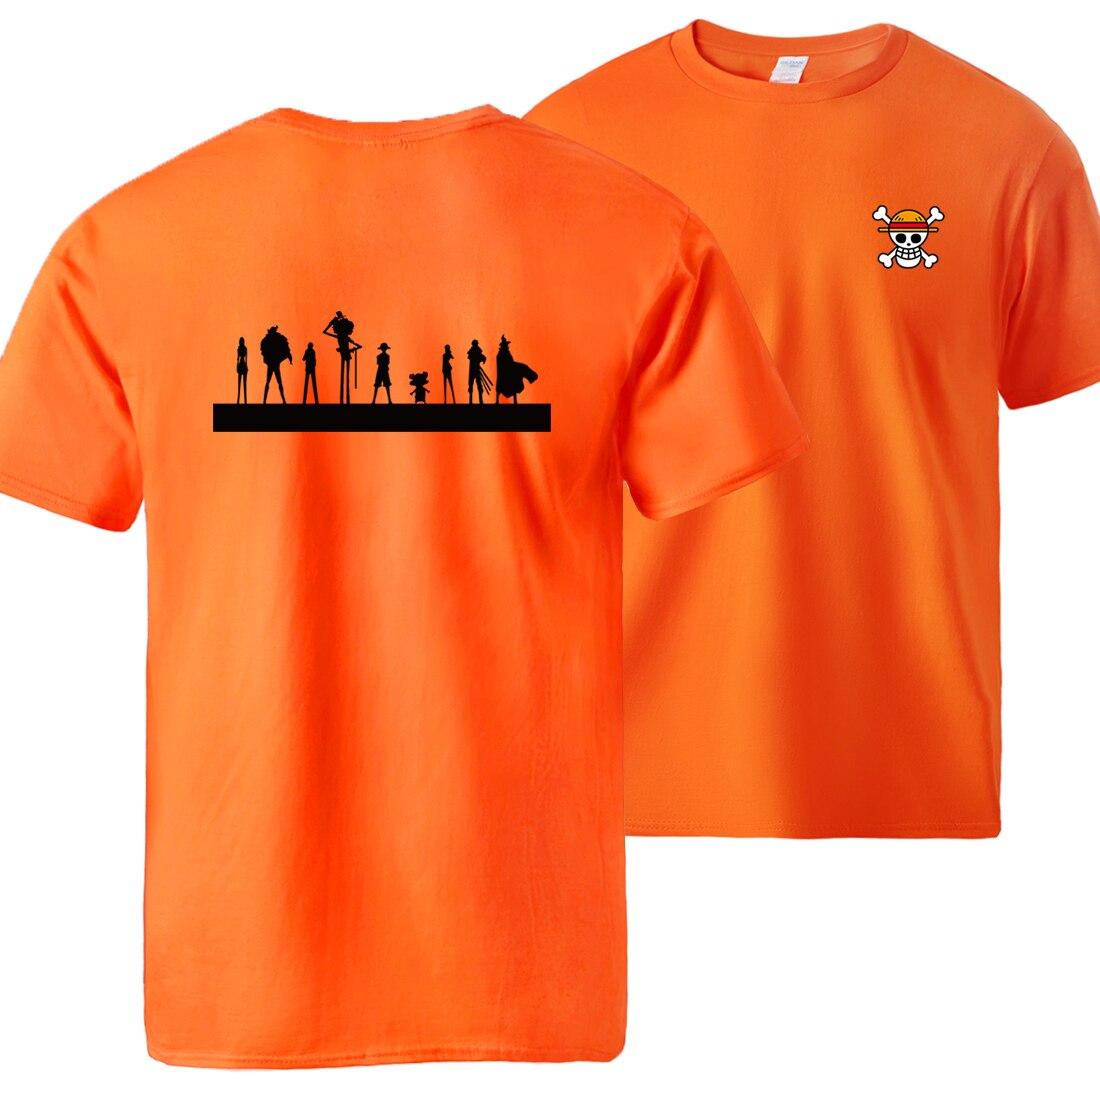 T-Shirt One Piece Shadows